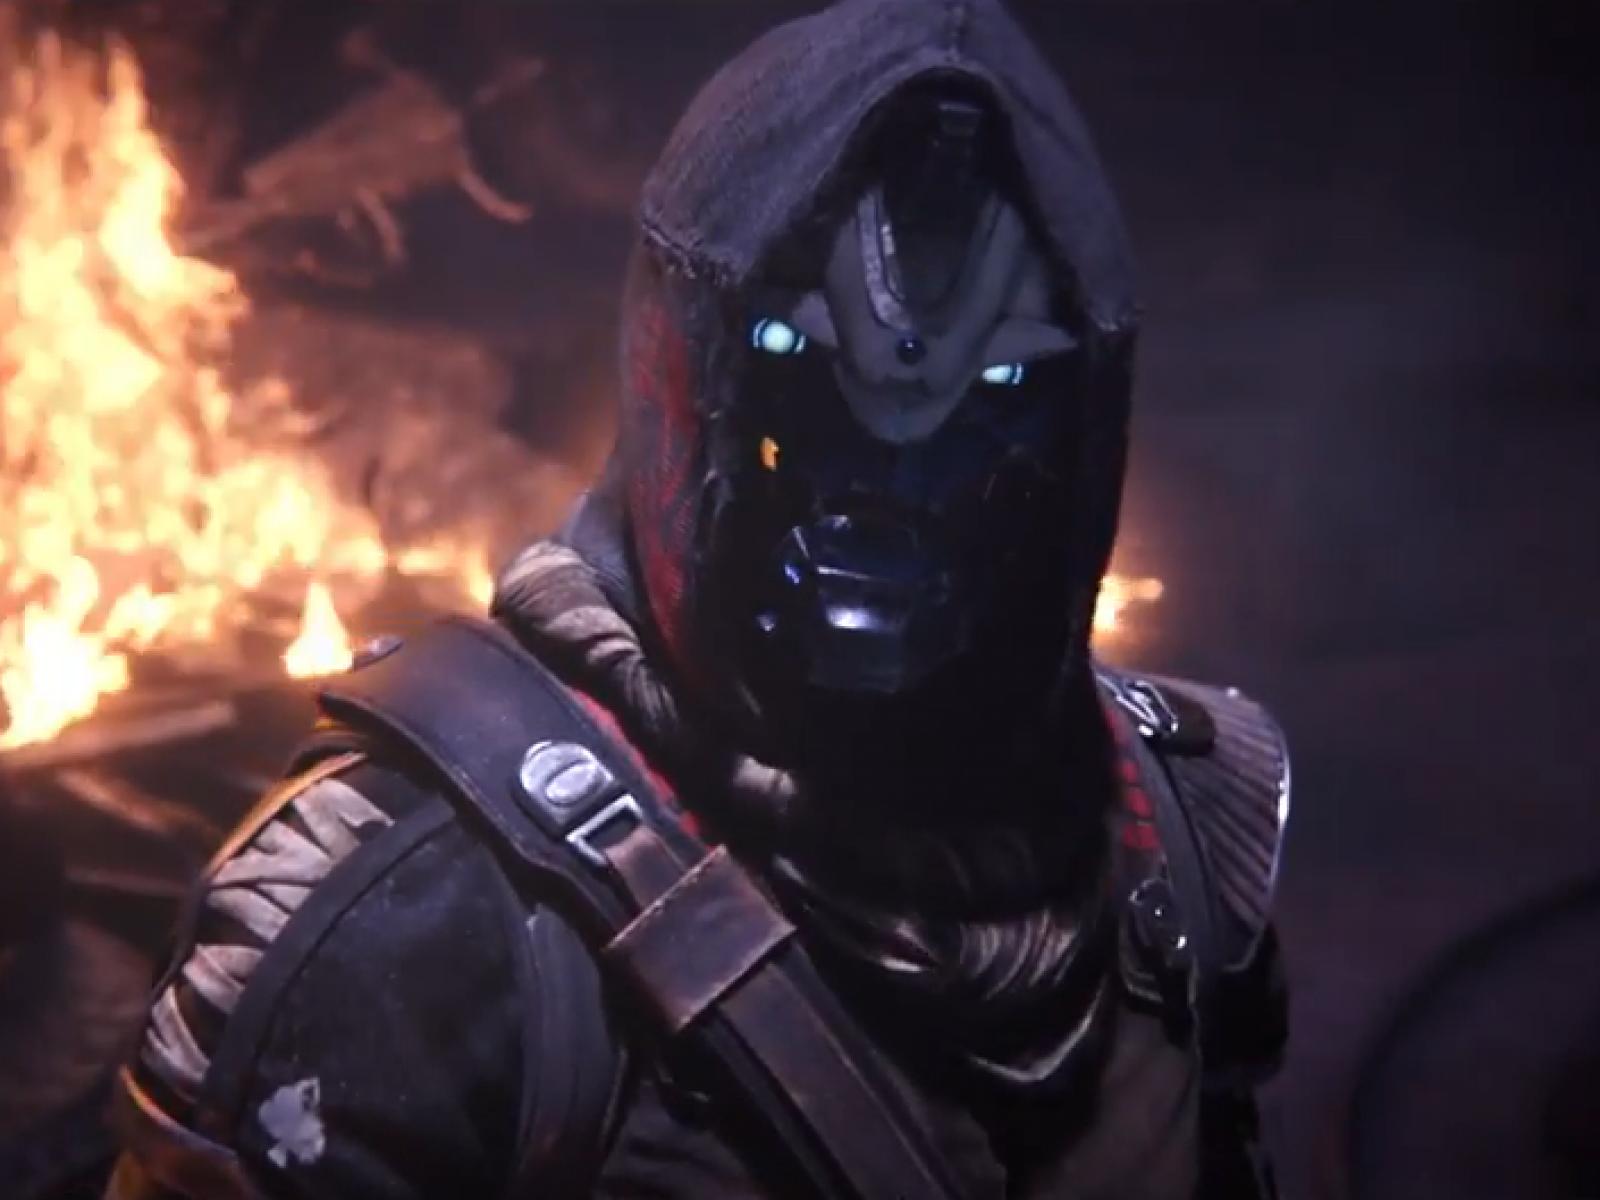 Destiny 2 Gamescom Trailer Shows Cayde S Death Gambit Trial Announced